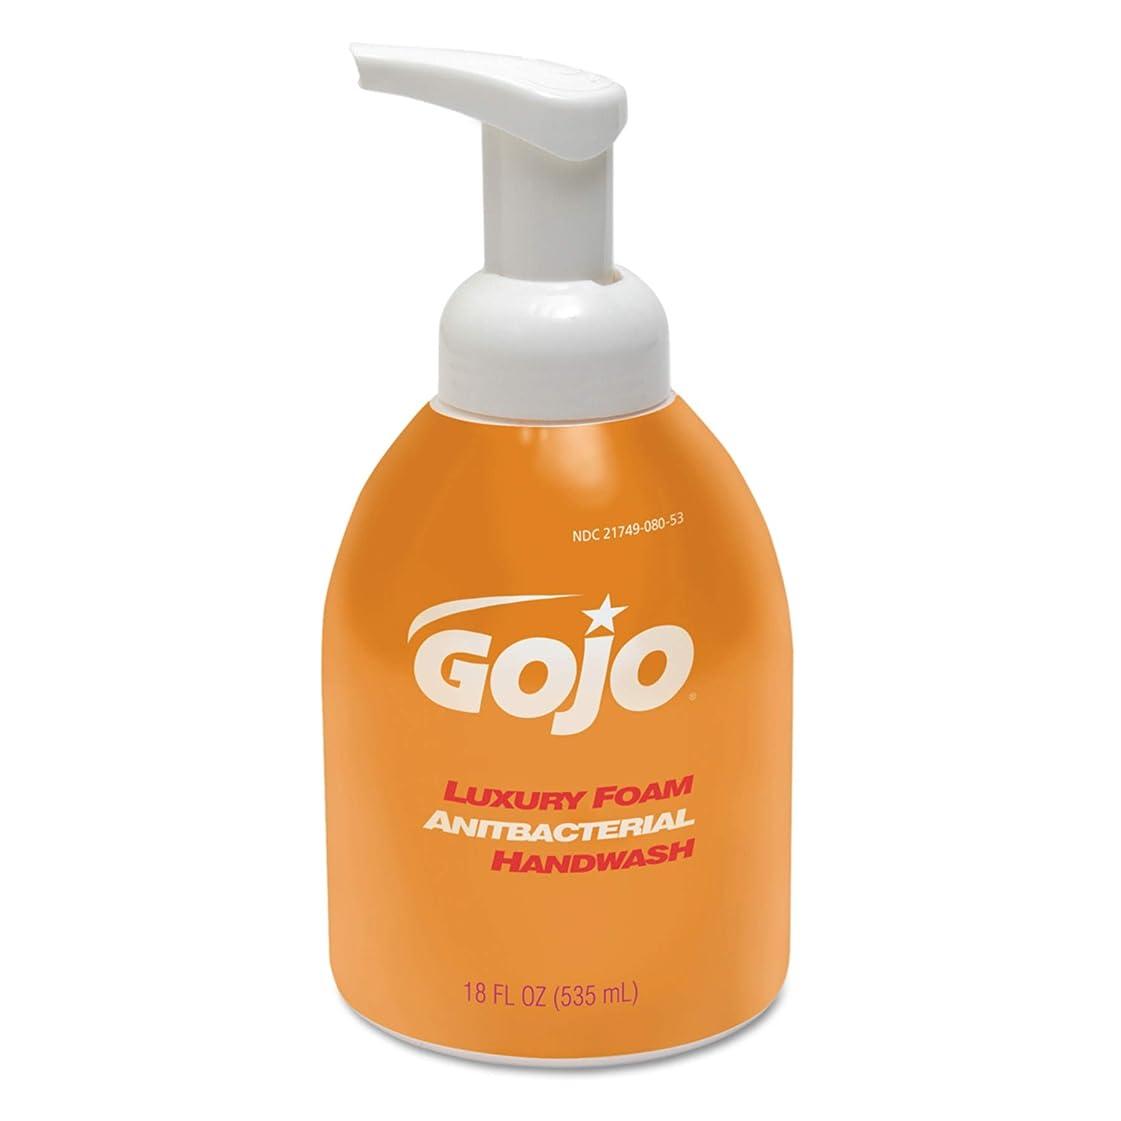 他の場所最大橋脚Luxury Foam Antibacterial Handwash, Orange Blossom, 18 oz Pump (並行輸入品)